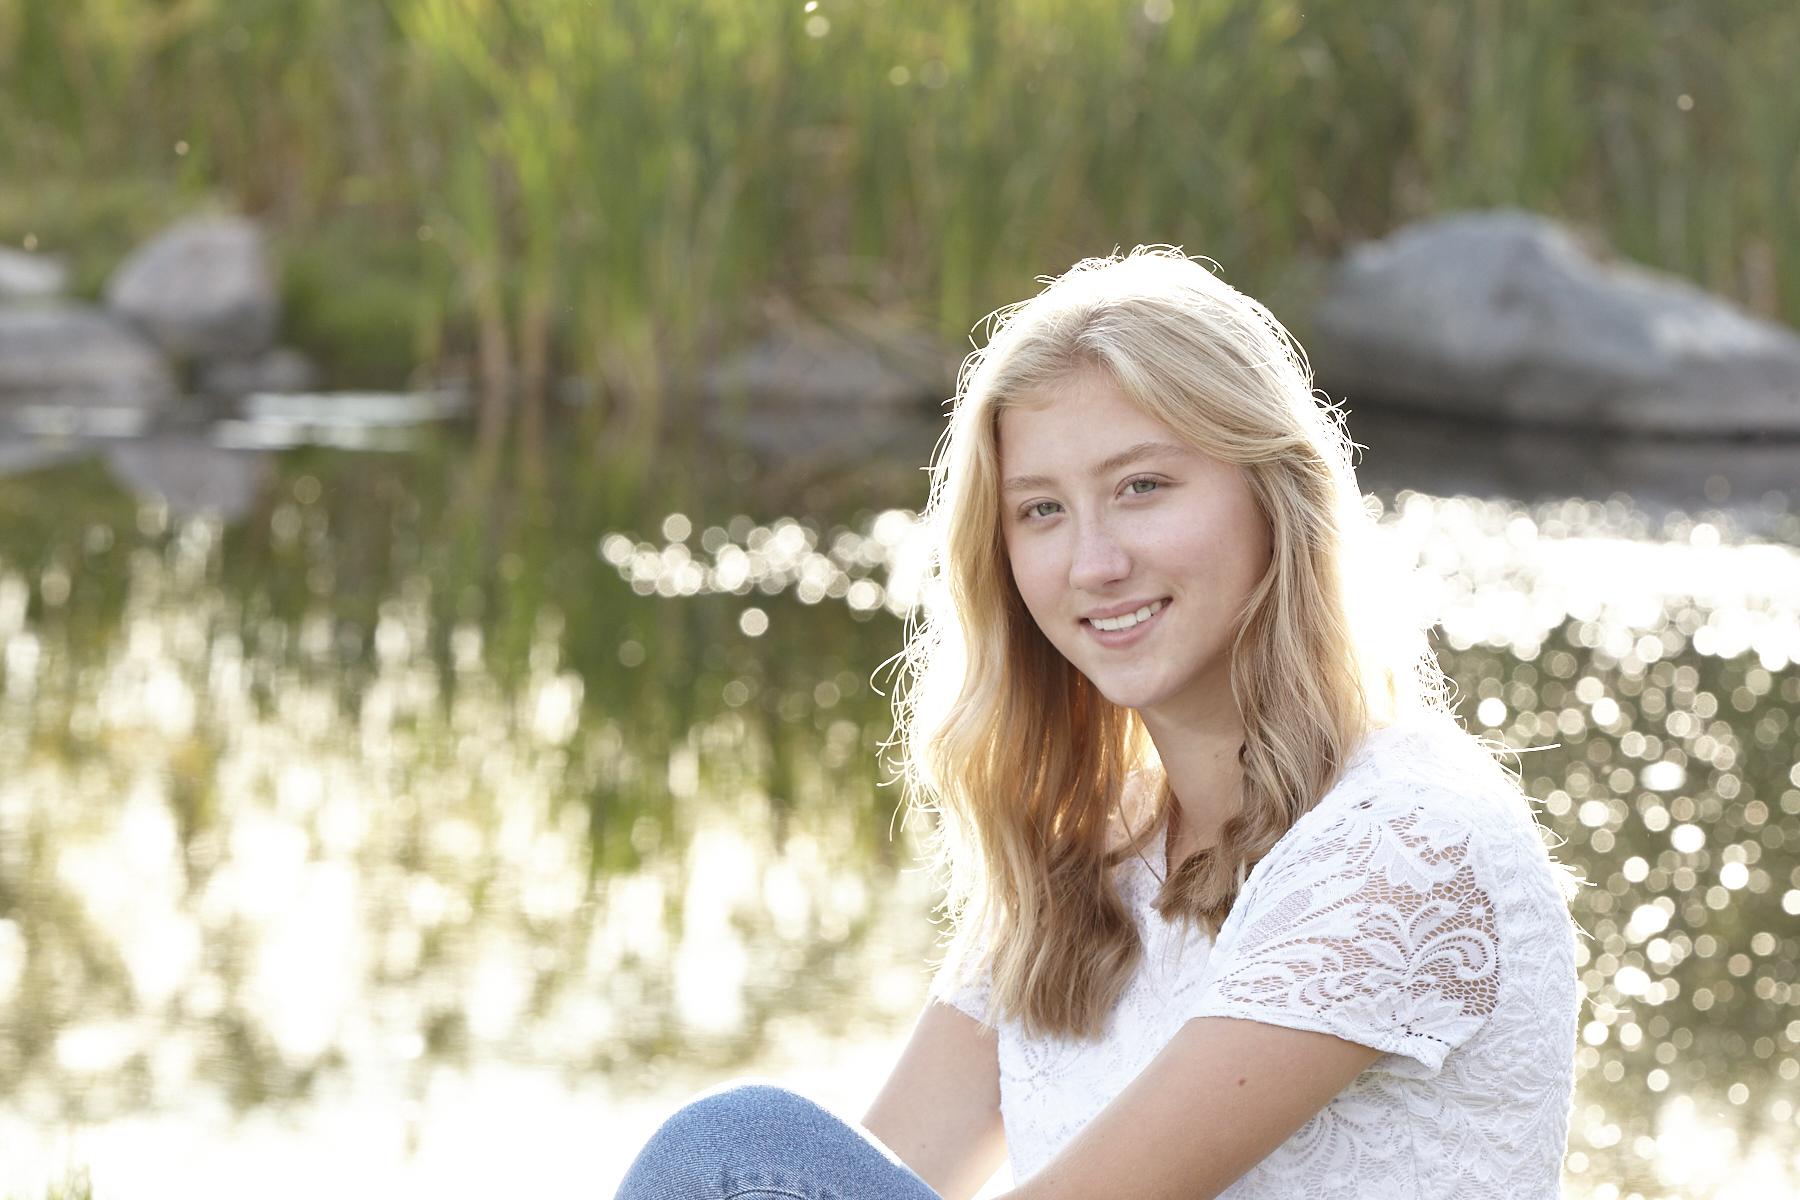 cindy-moleski-professional-portrait-sweet16-photographer-saskatoon-saskatchewan-29585-0110e.jpg